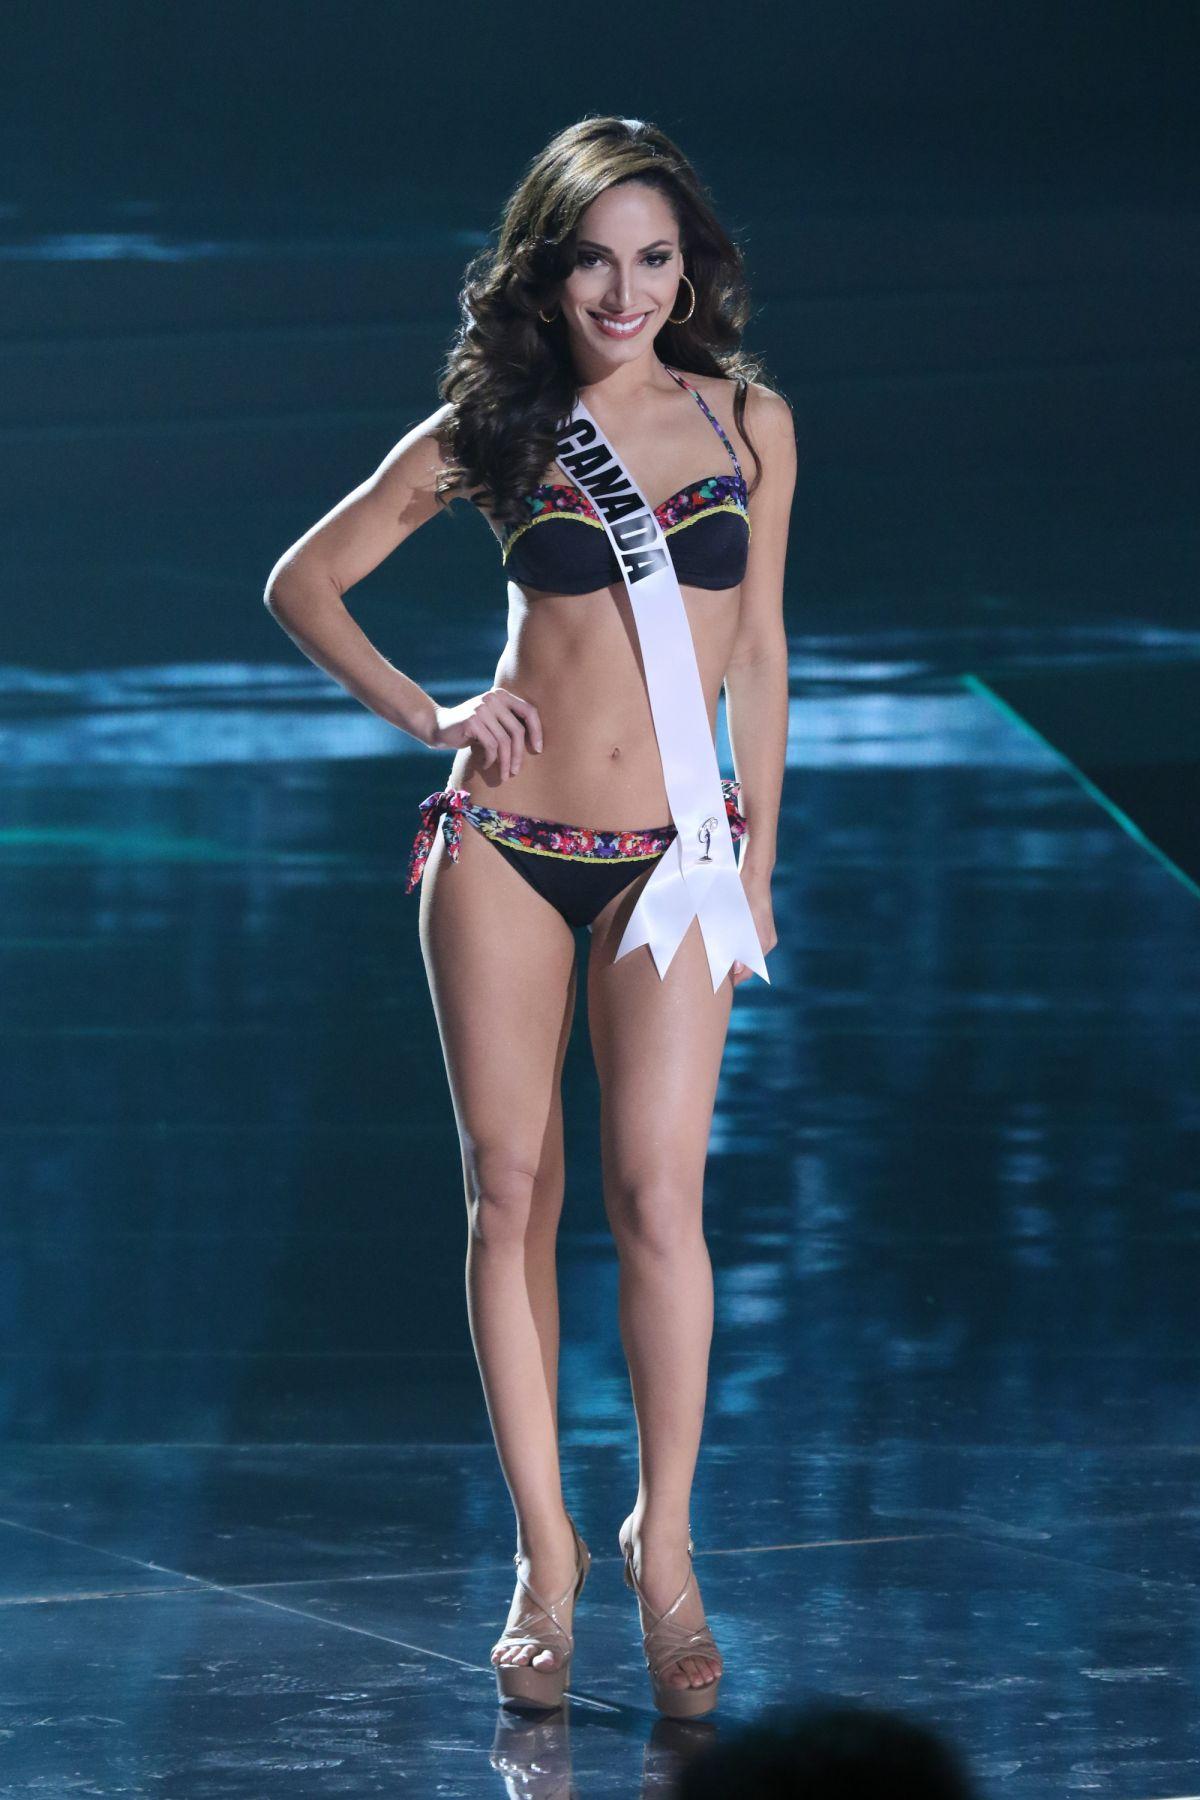 PAOLA NUNEZ - Miss Universe 2015 Preliminary Round 12/16/2015